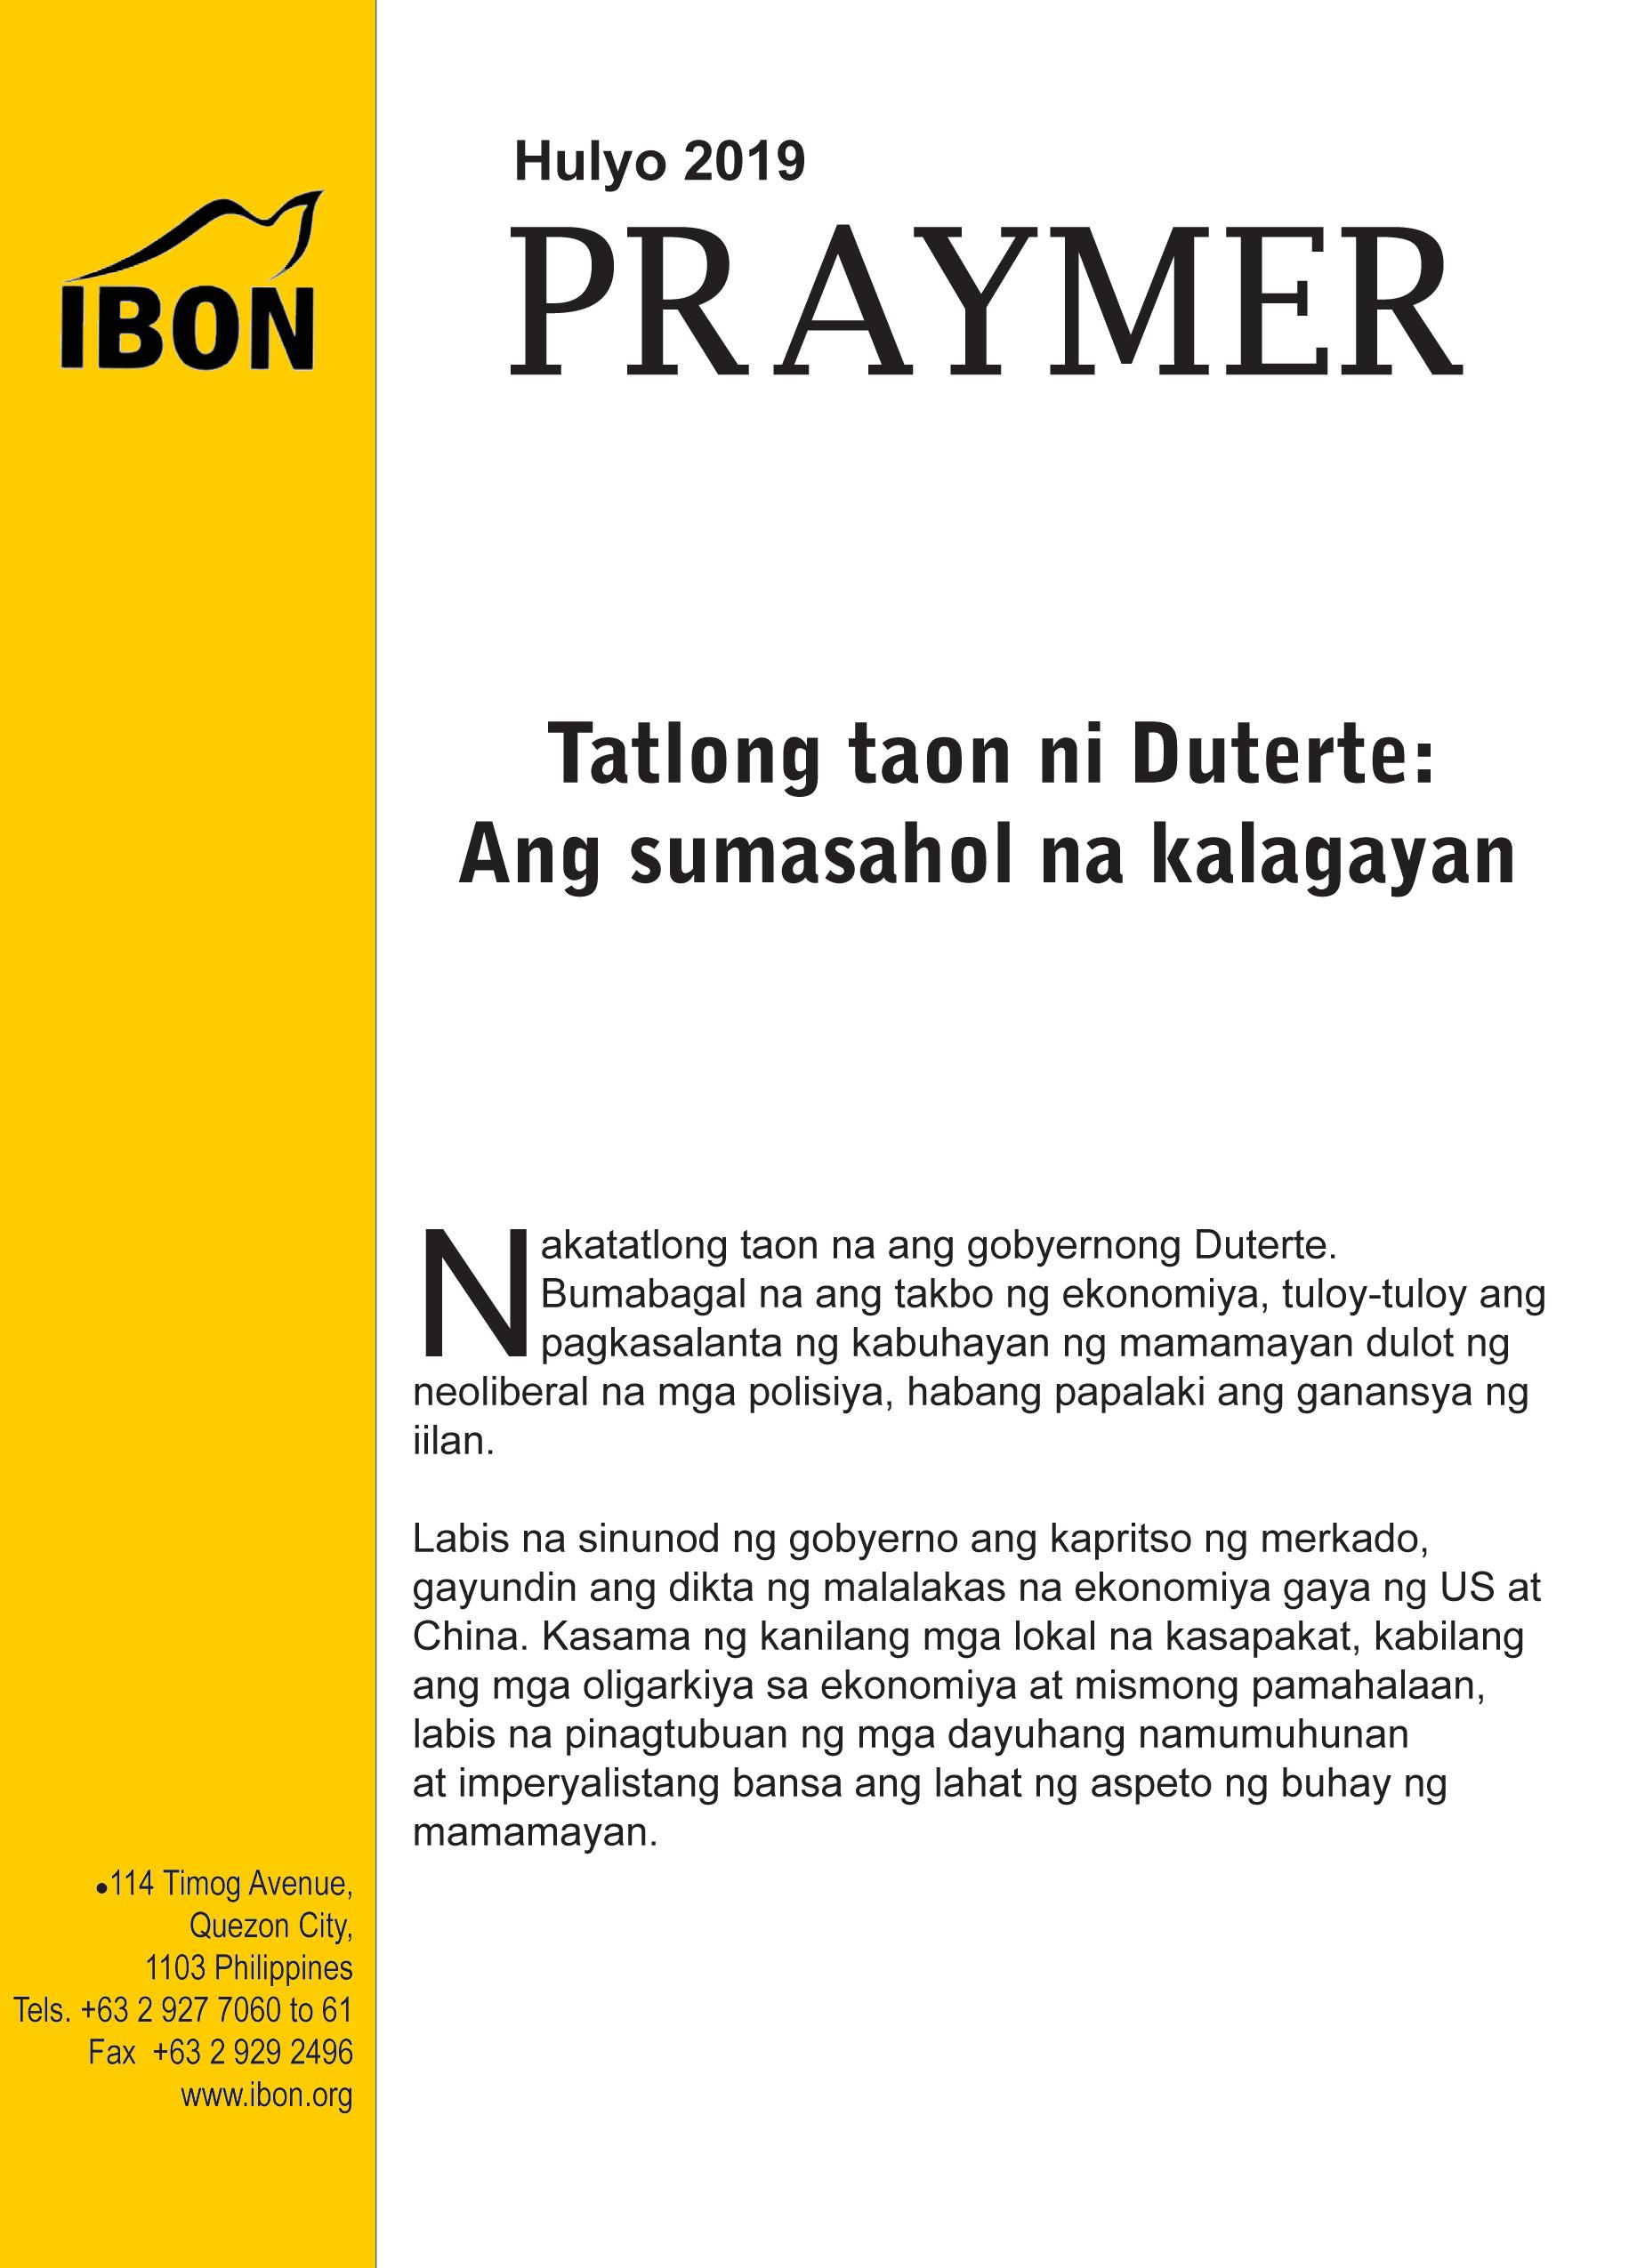 IBON Foundation – Serving the Filipino people through